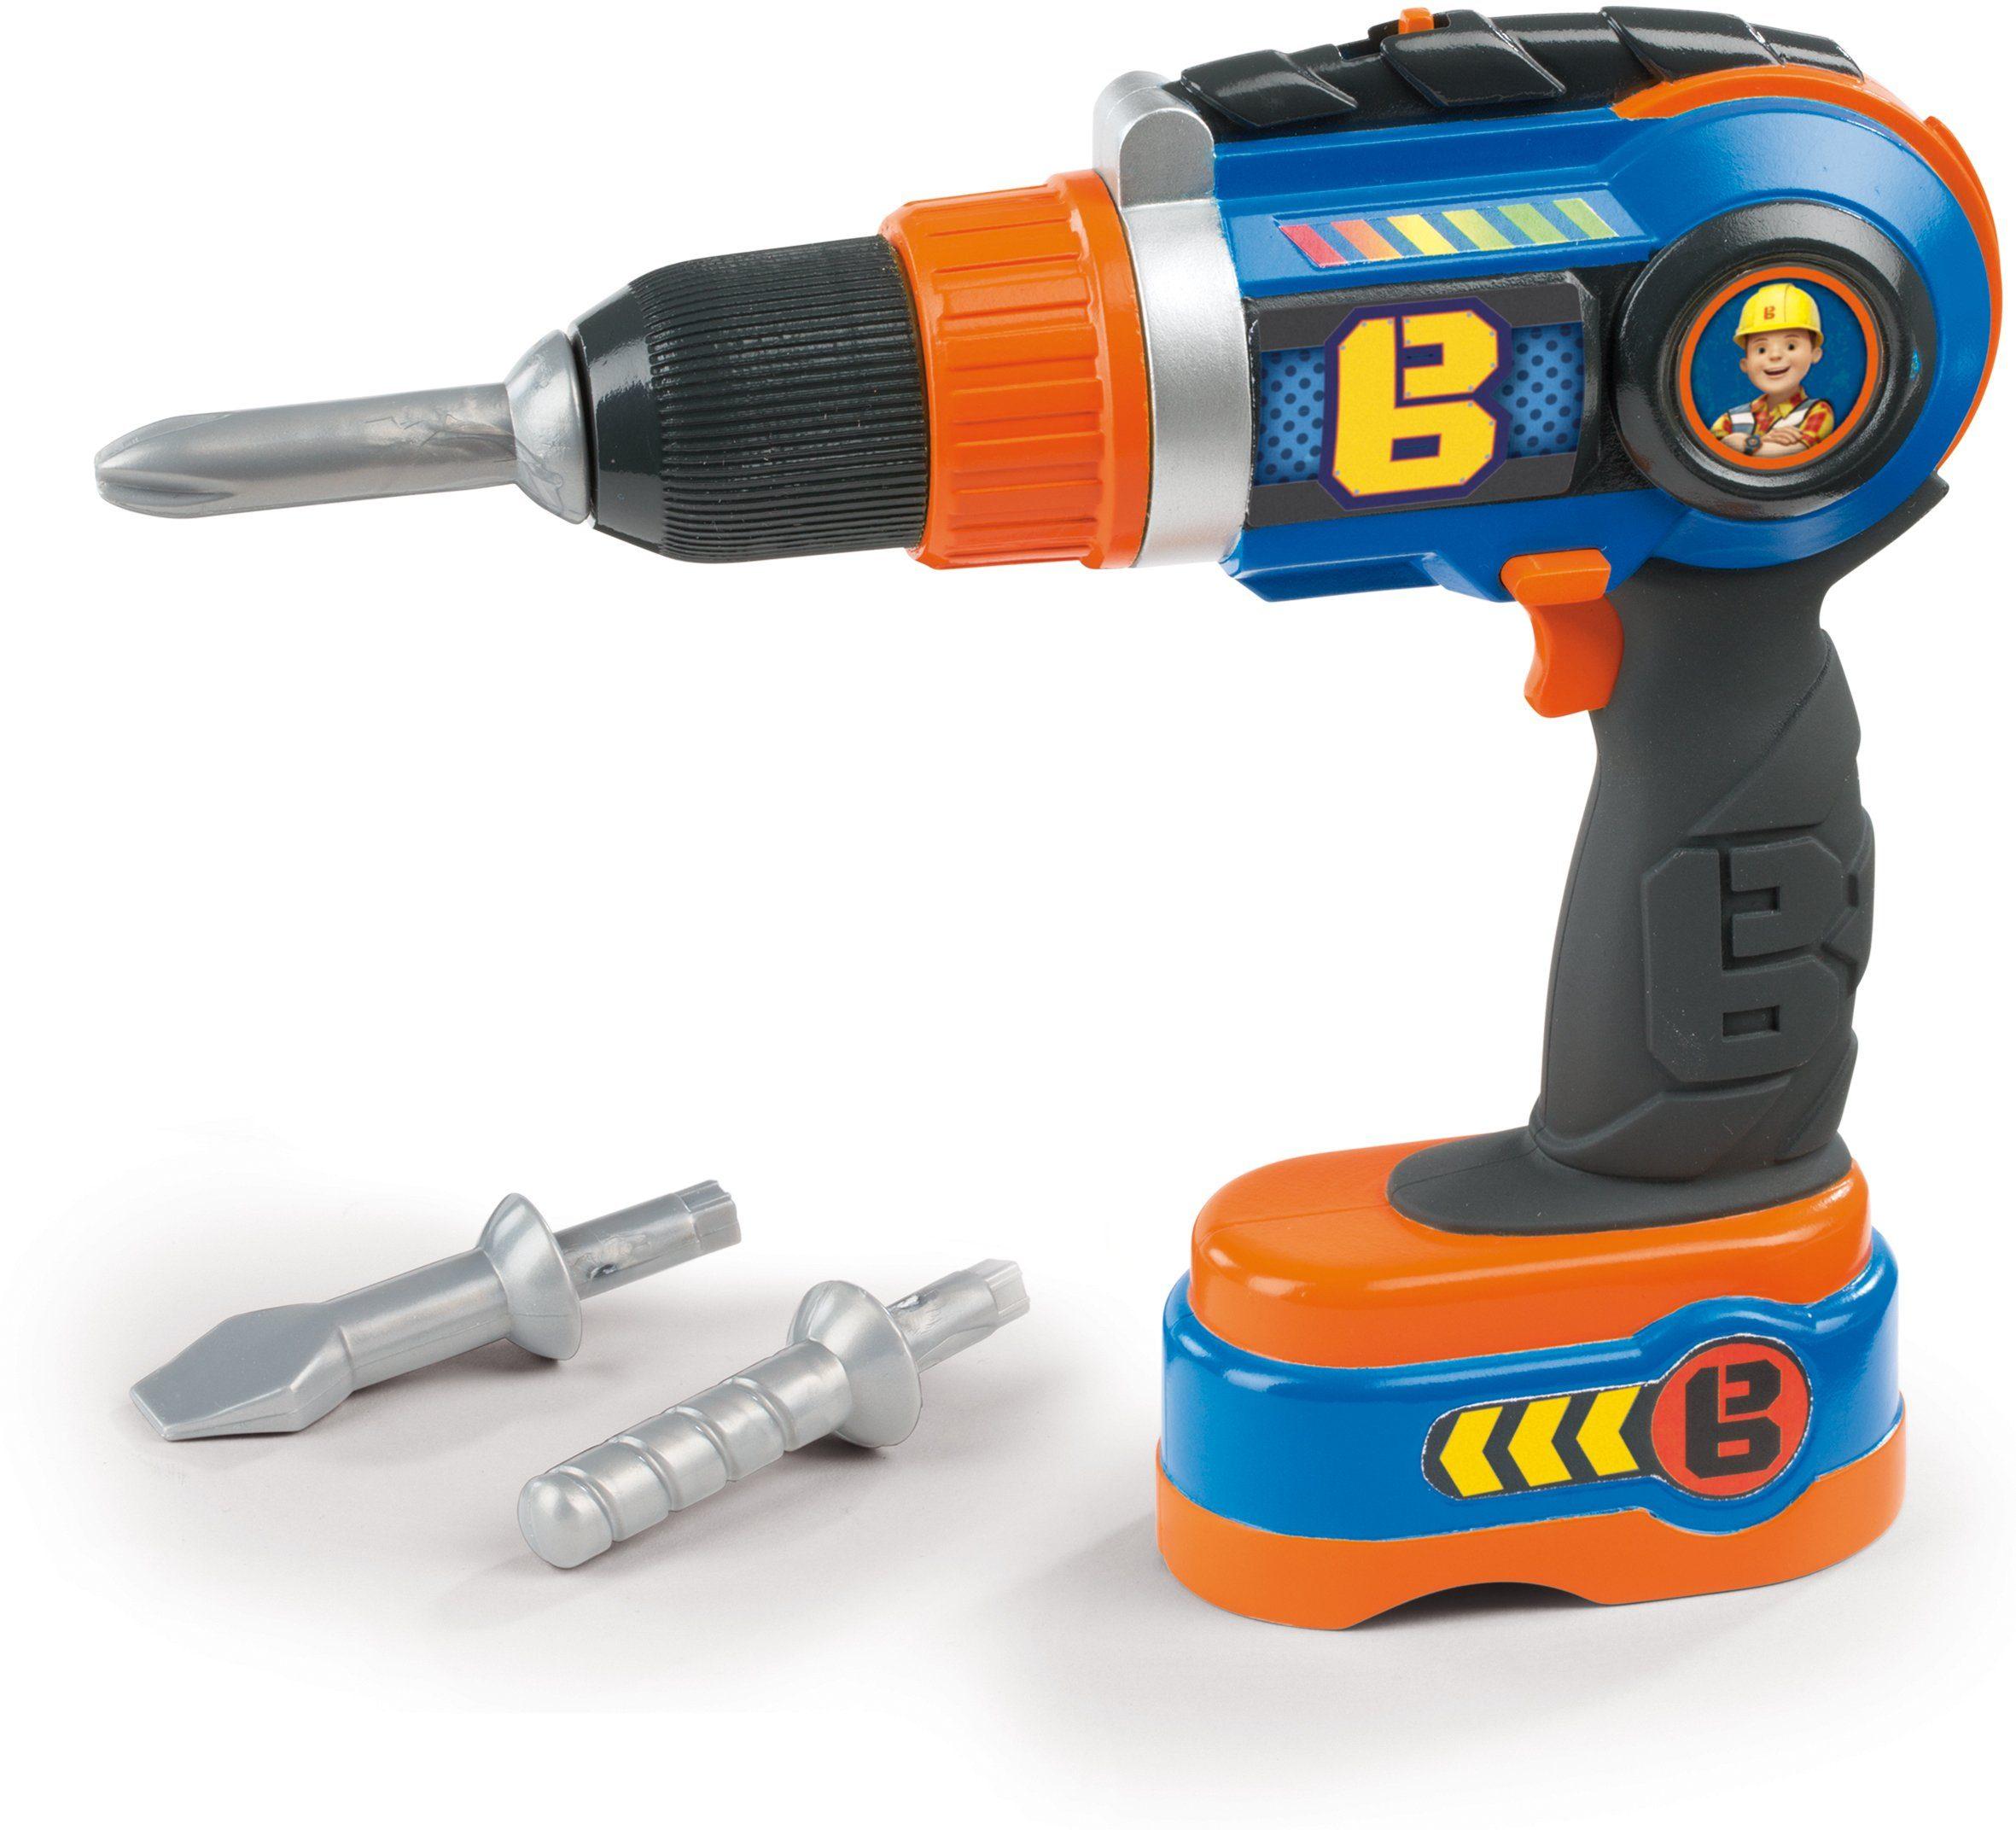 Smoby Spielakkuschrauber, »Bob der Baumeister elektronischer Akkuschrauber«